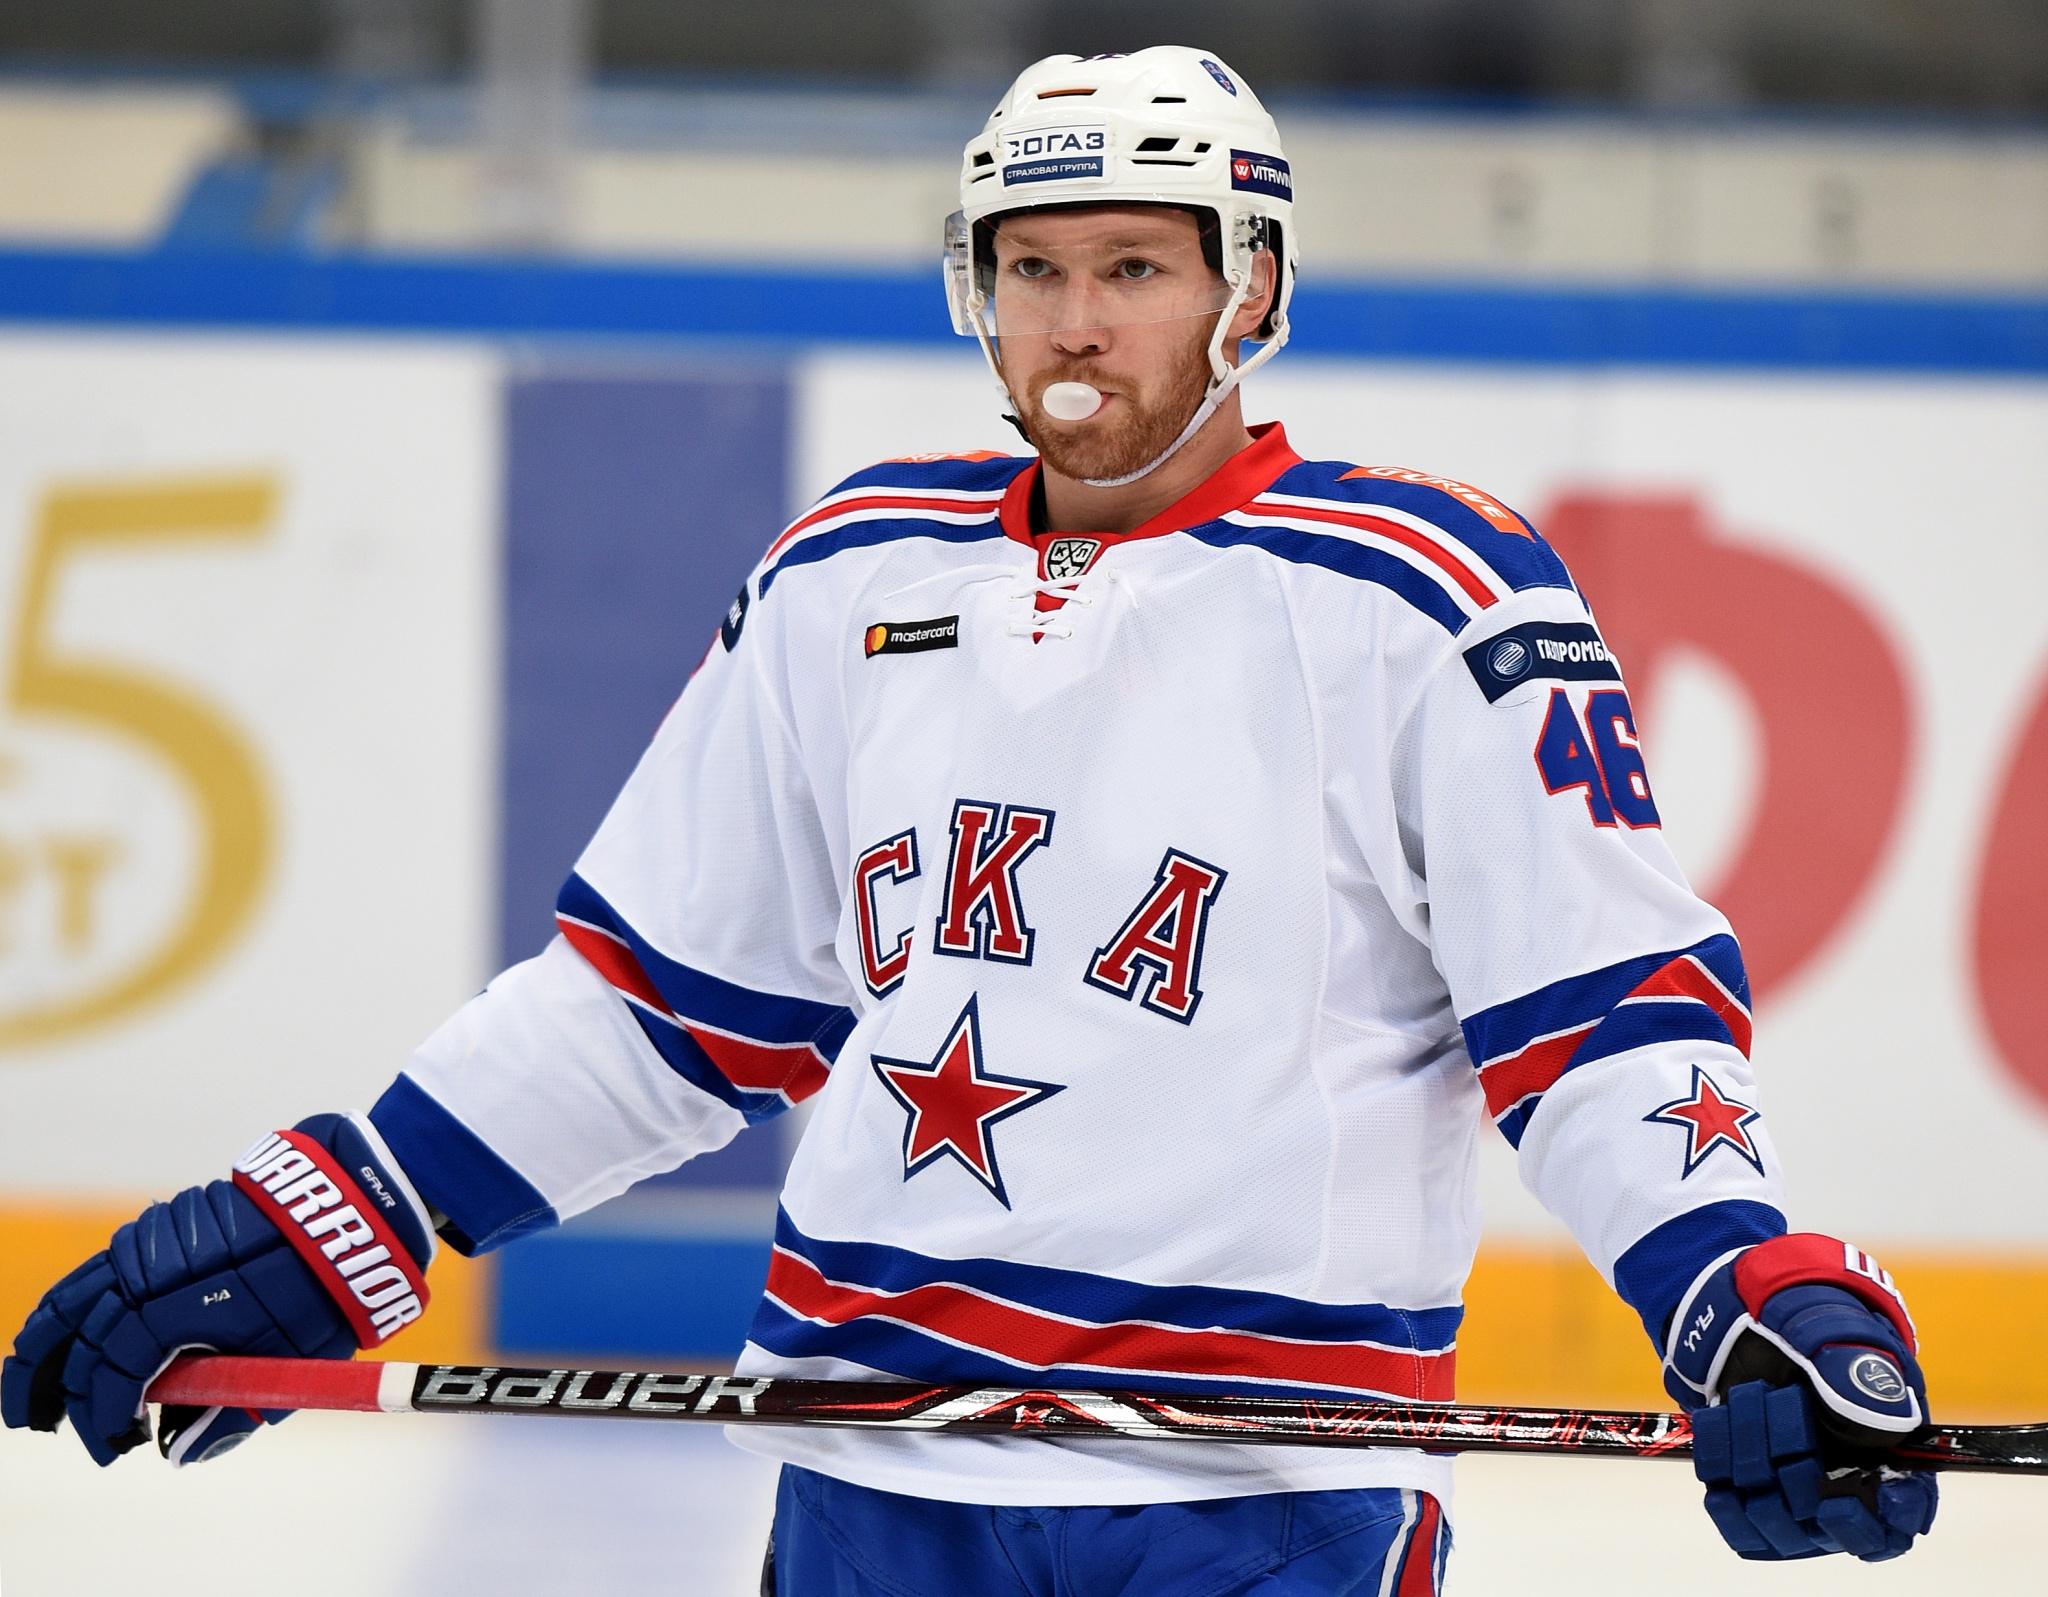 Владислав Гавриков. Фото: Юрий Кузьмин